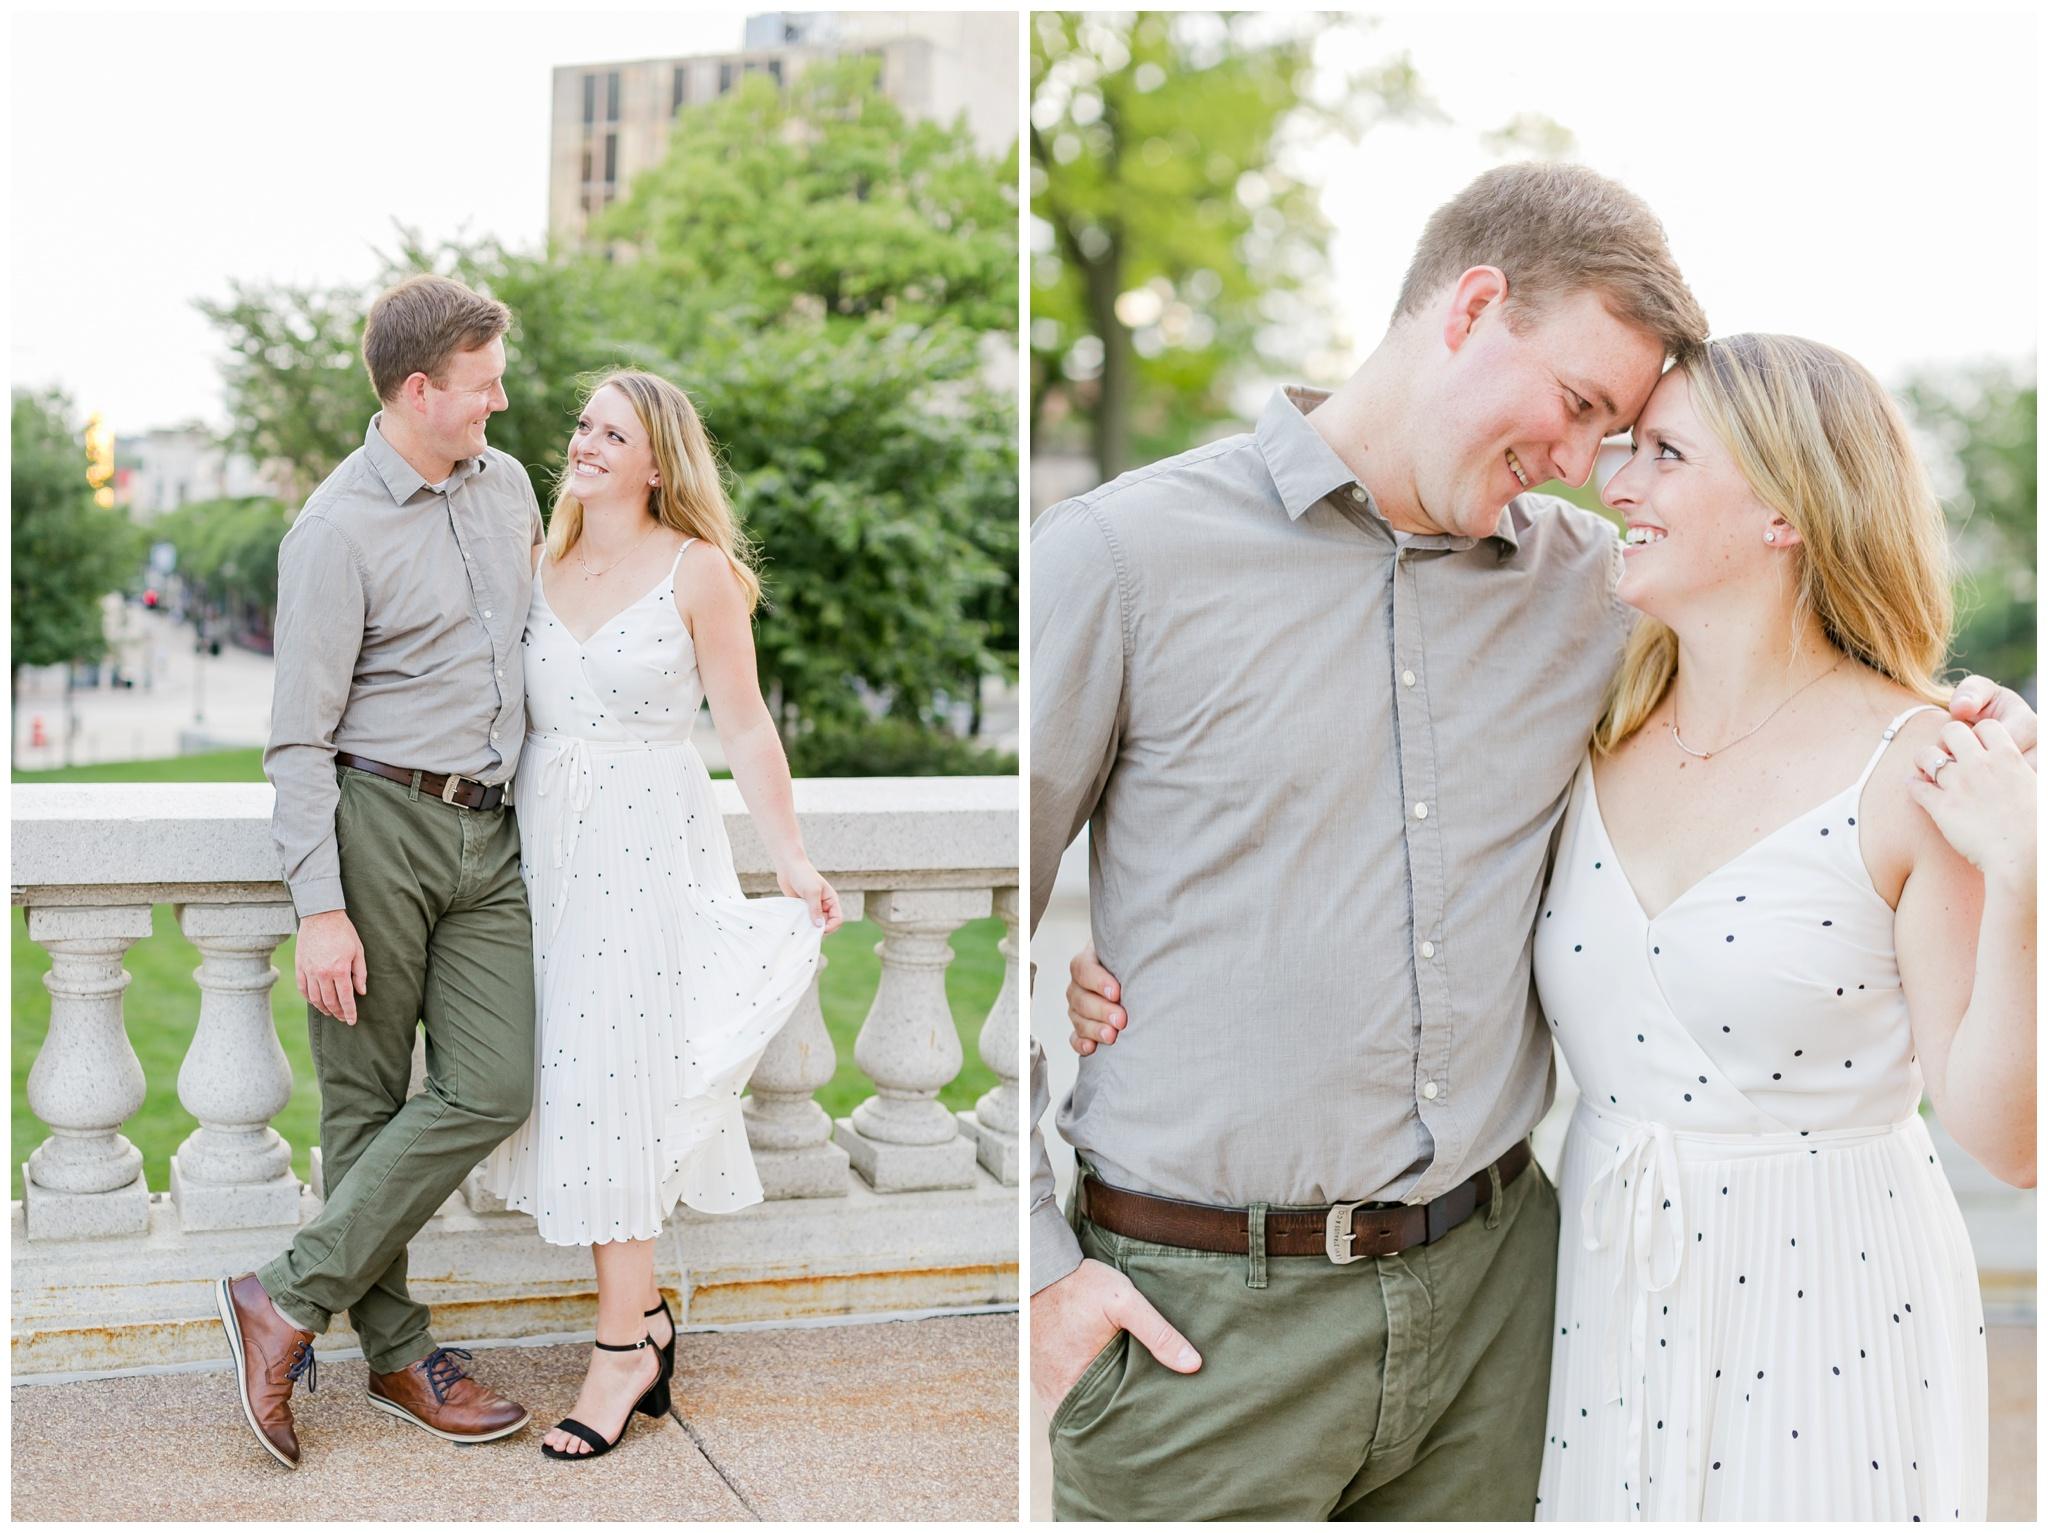 madison_wisconsin_wedding_photographers_downtown_engagement_session_4498.jpg